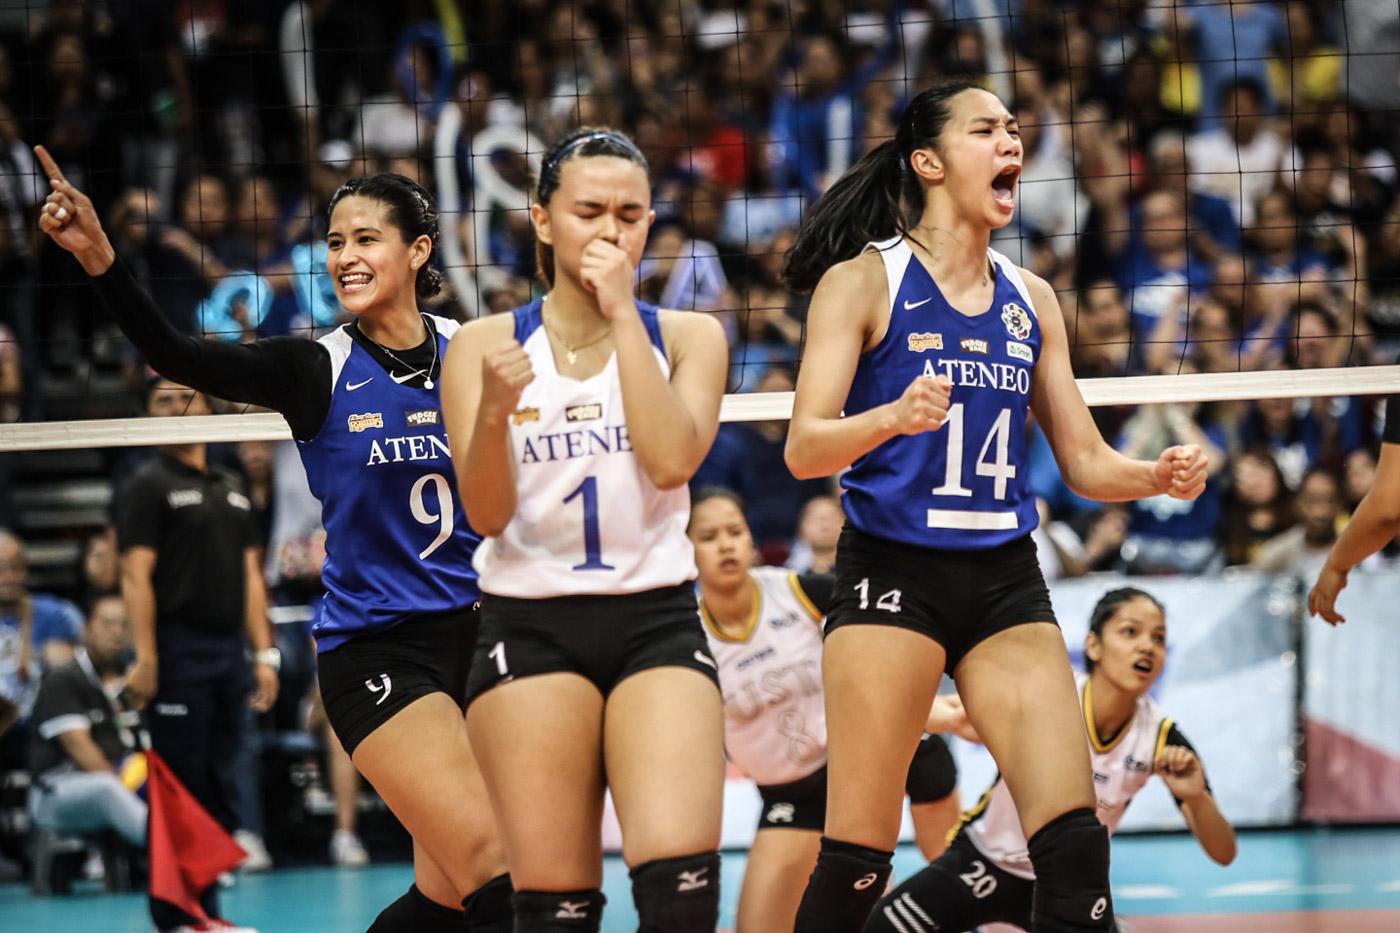 Ateneo breaks UST's heart, reclaims UAAP volleyball crown